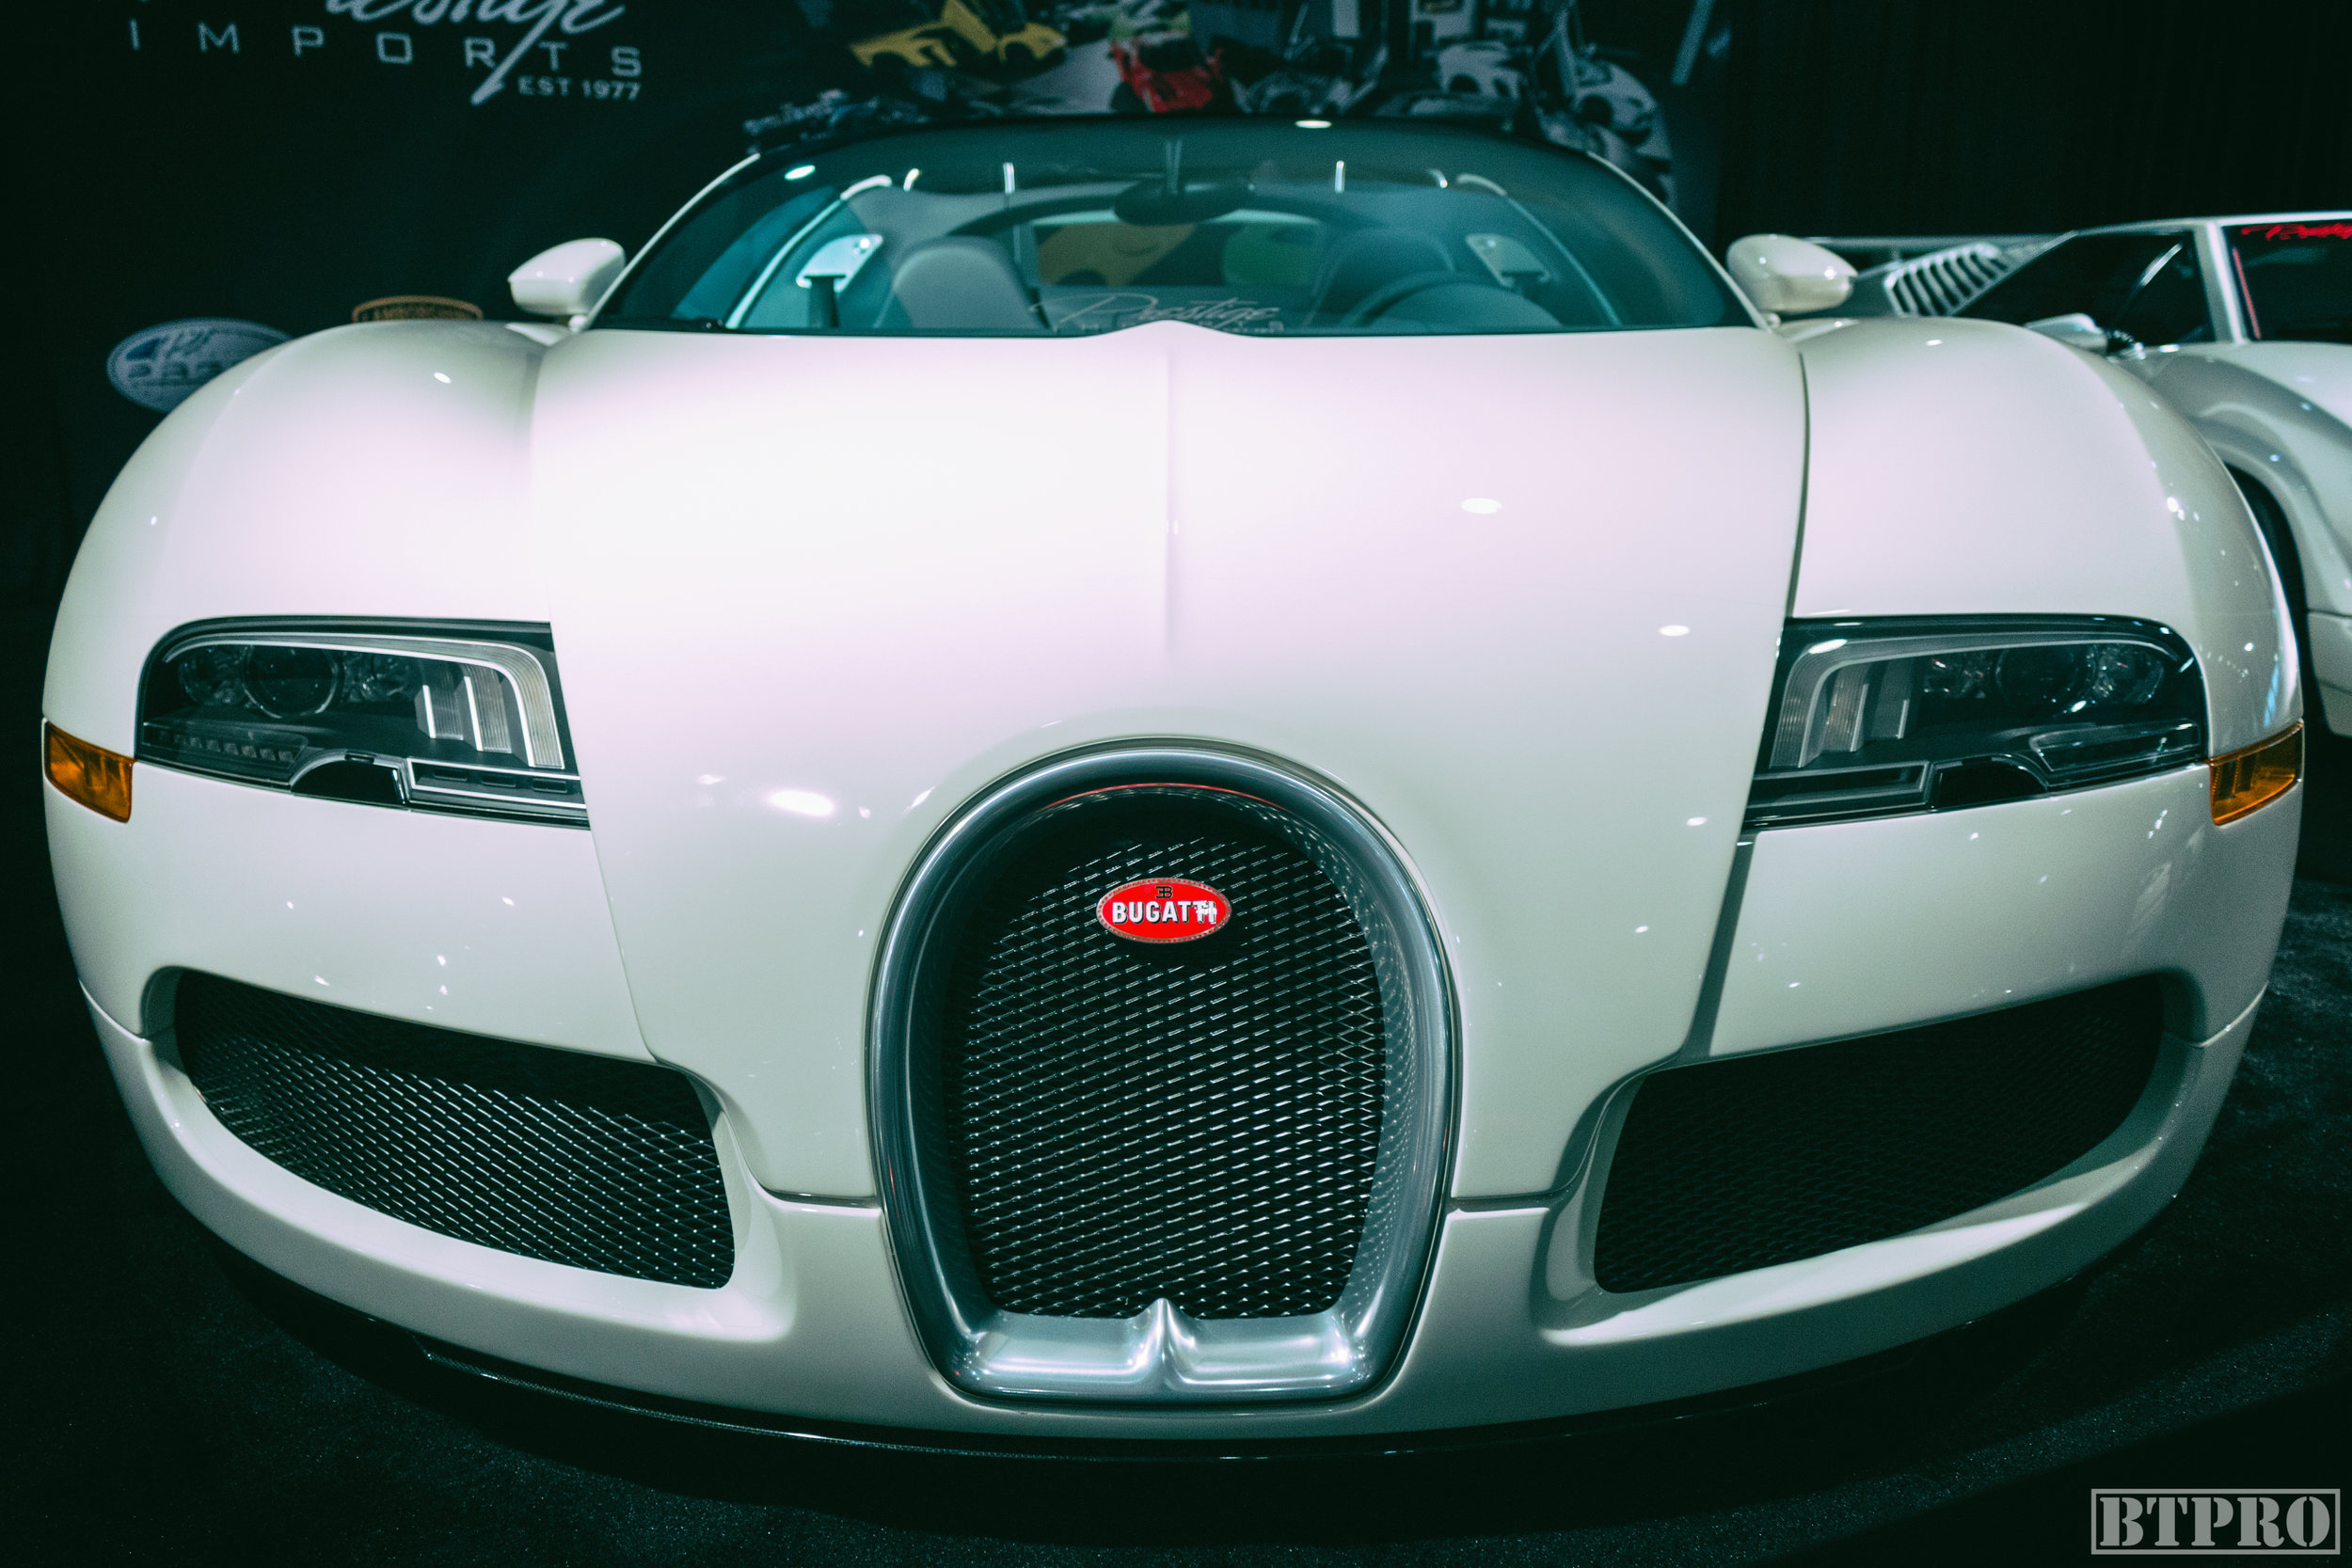 bugatti, veyron, bugatti veyron, car show, miami, miami international car show, miami international auto show, auto show, exotic cars, muscle cars, car photography